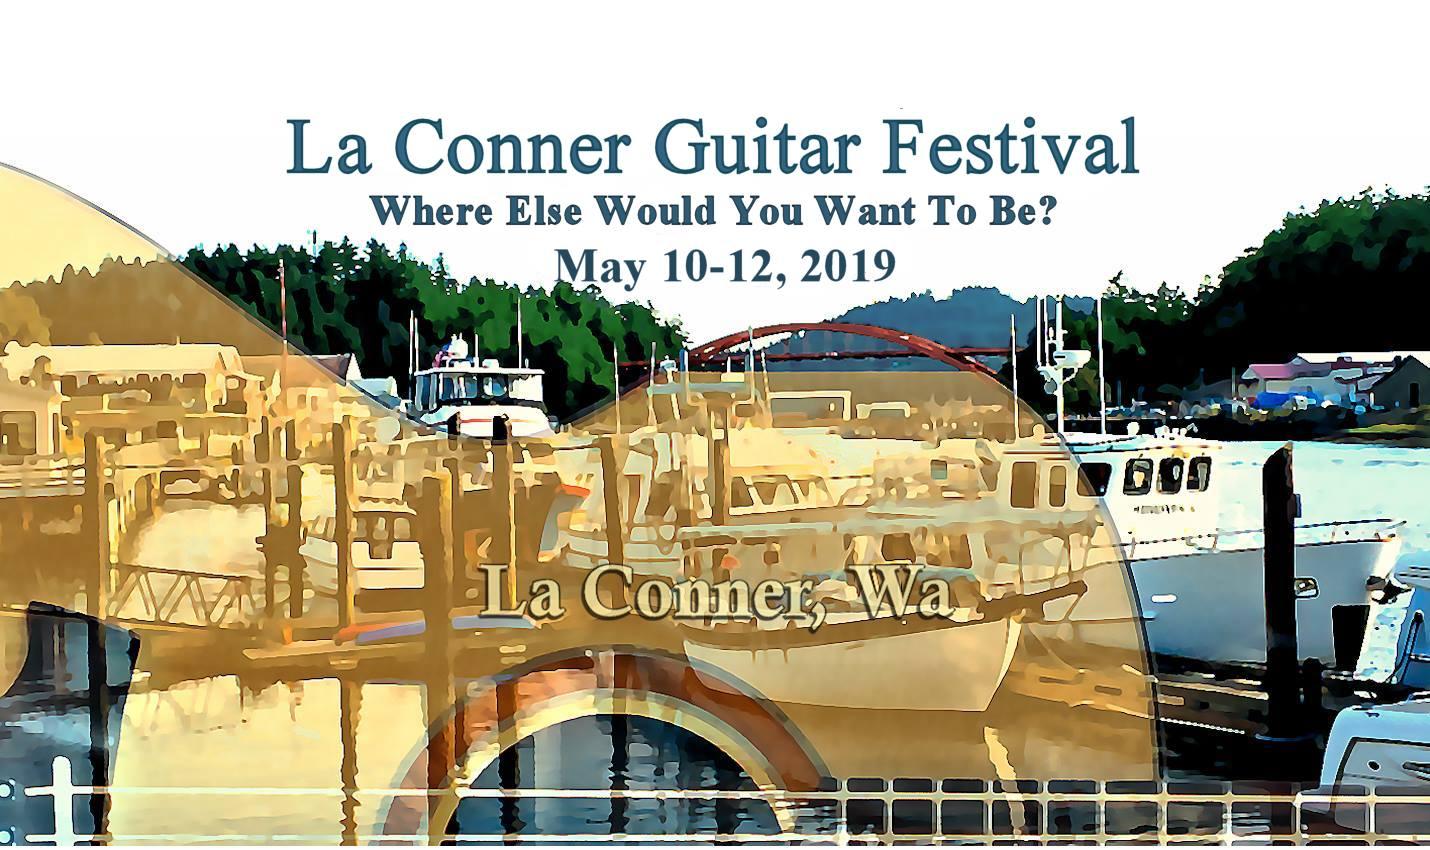 Poster for 2019 La Conner Guitar Festival